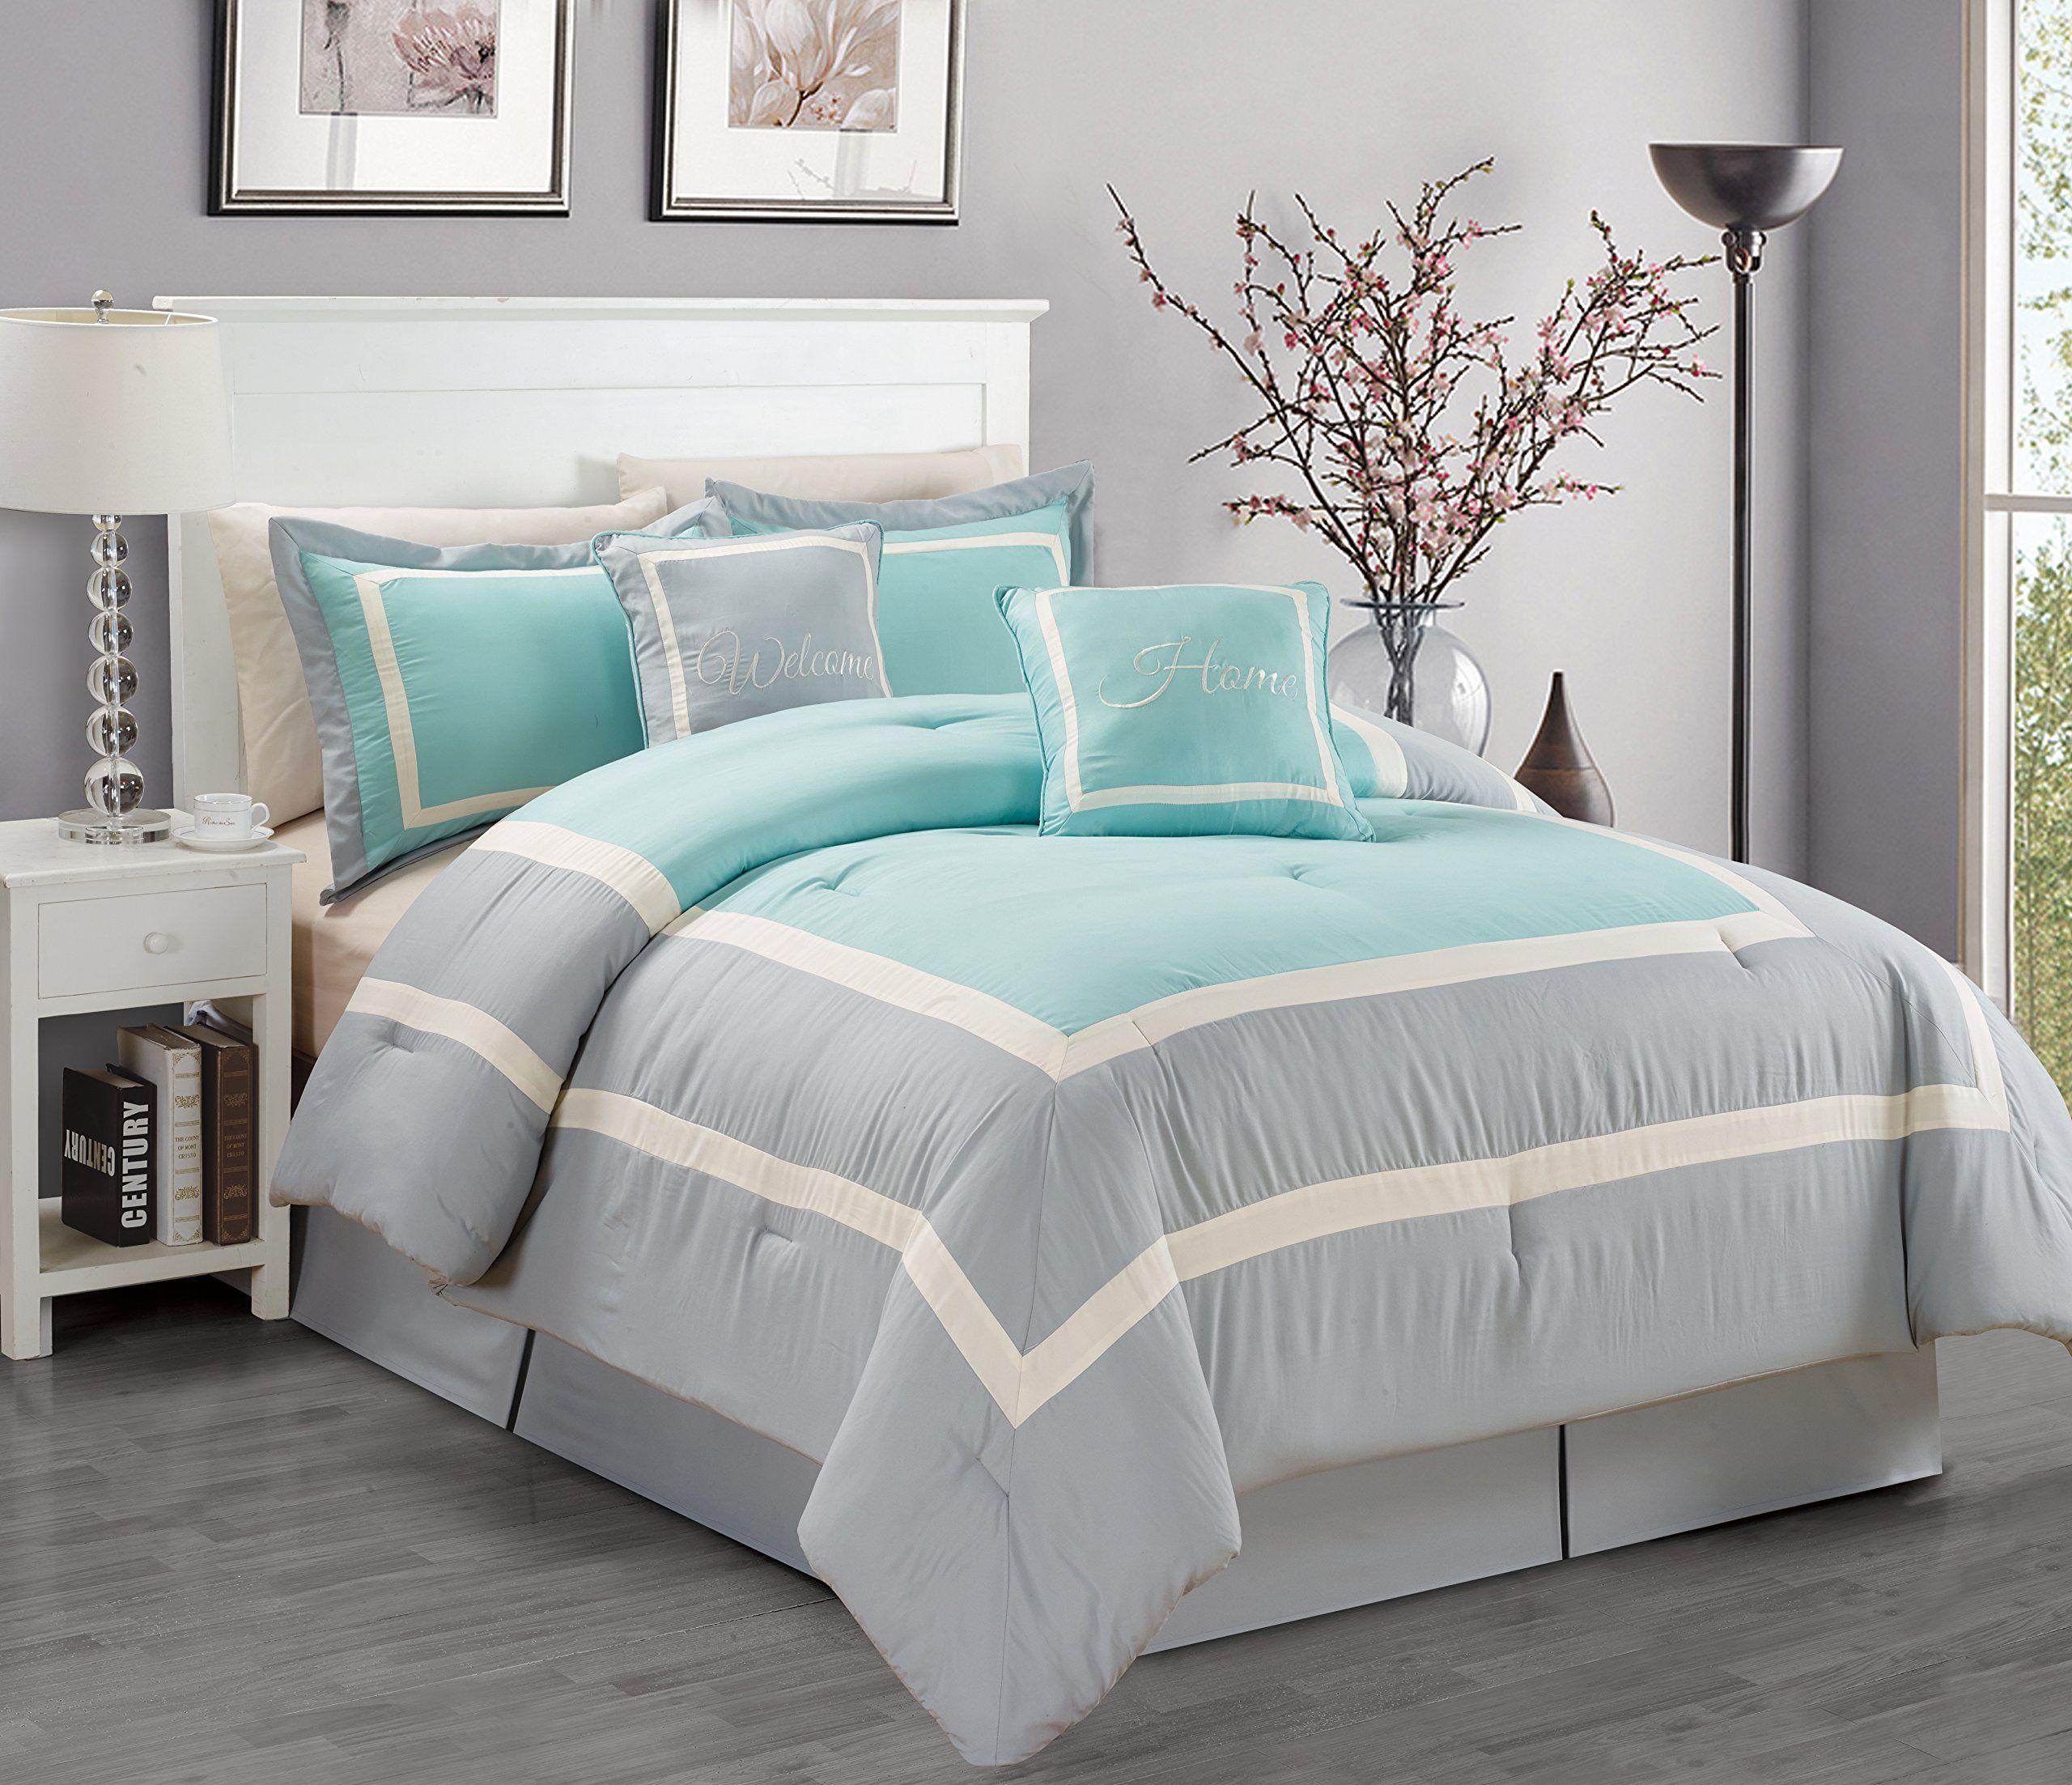 Robot Check Luxury Homes King Comforter Sets Home